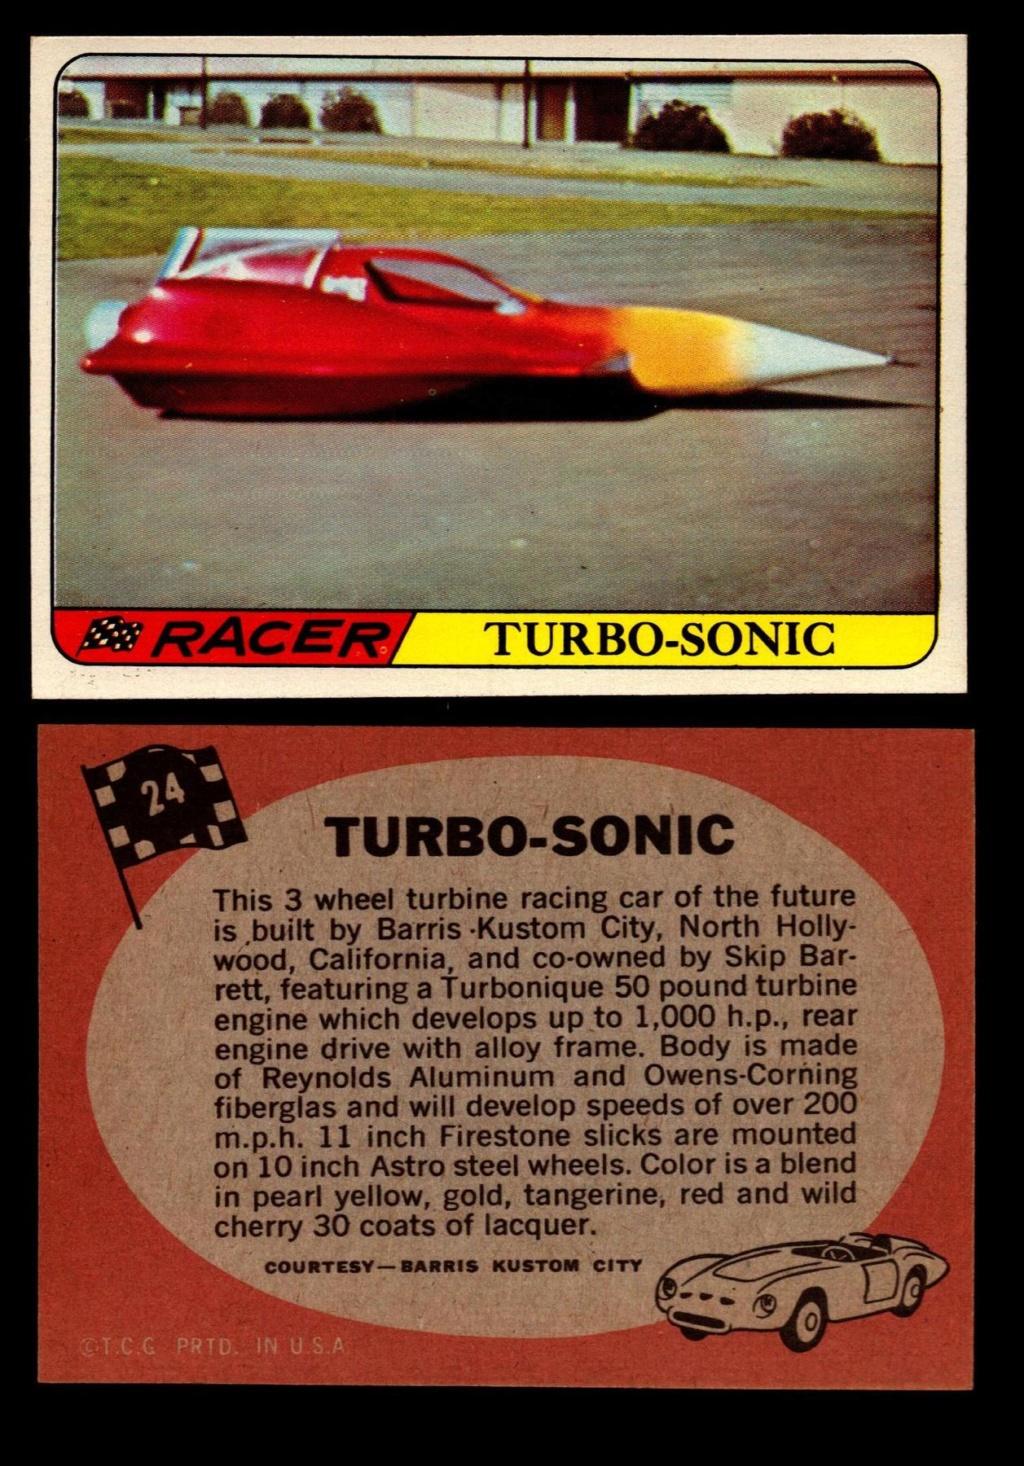 Hot Rods Topps - Vintage Trading Cards 1968 - Custom car - Dragster - Racer - Dream car - Barris Kustom City - Ed Roth Darrill Starbird, Gene Winfield, Bill Cuchenberry 24_af410